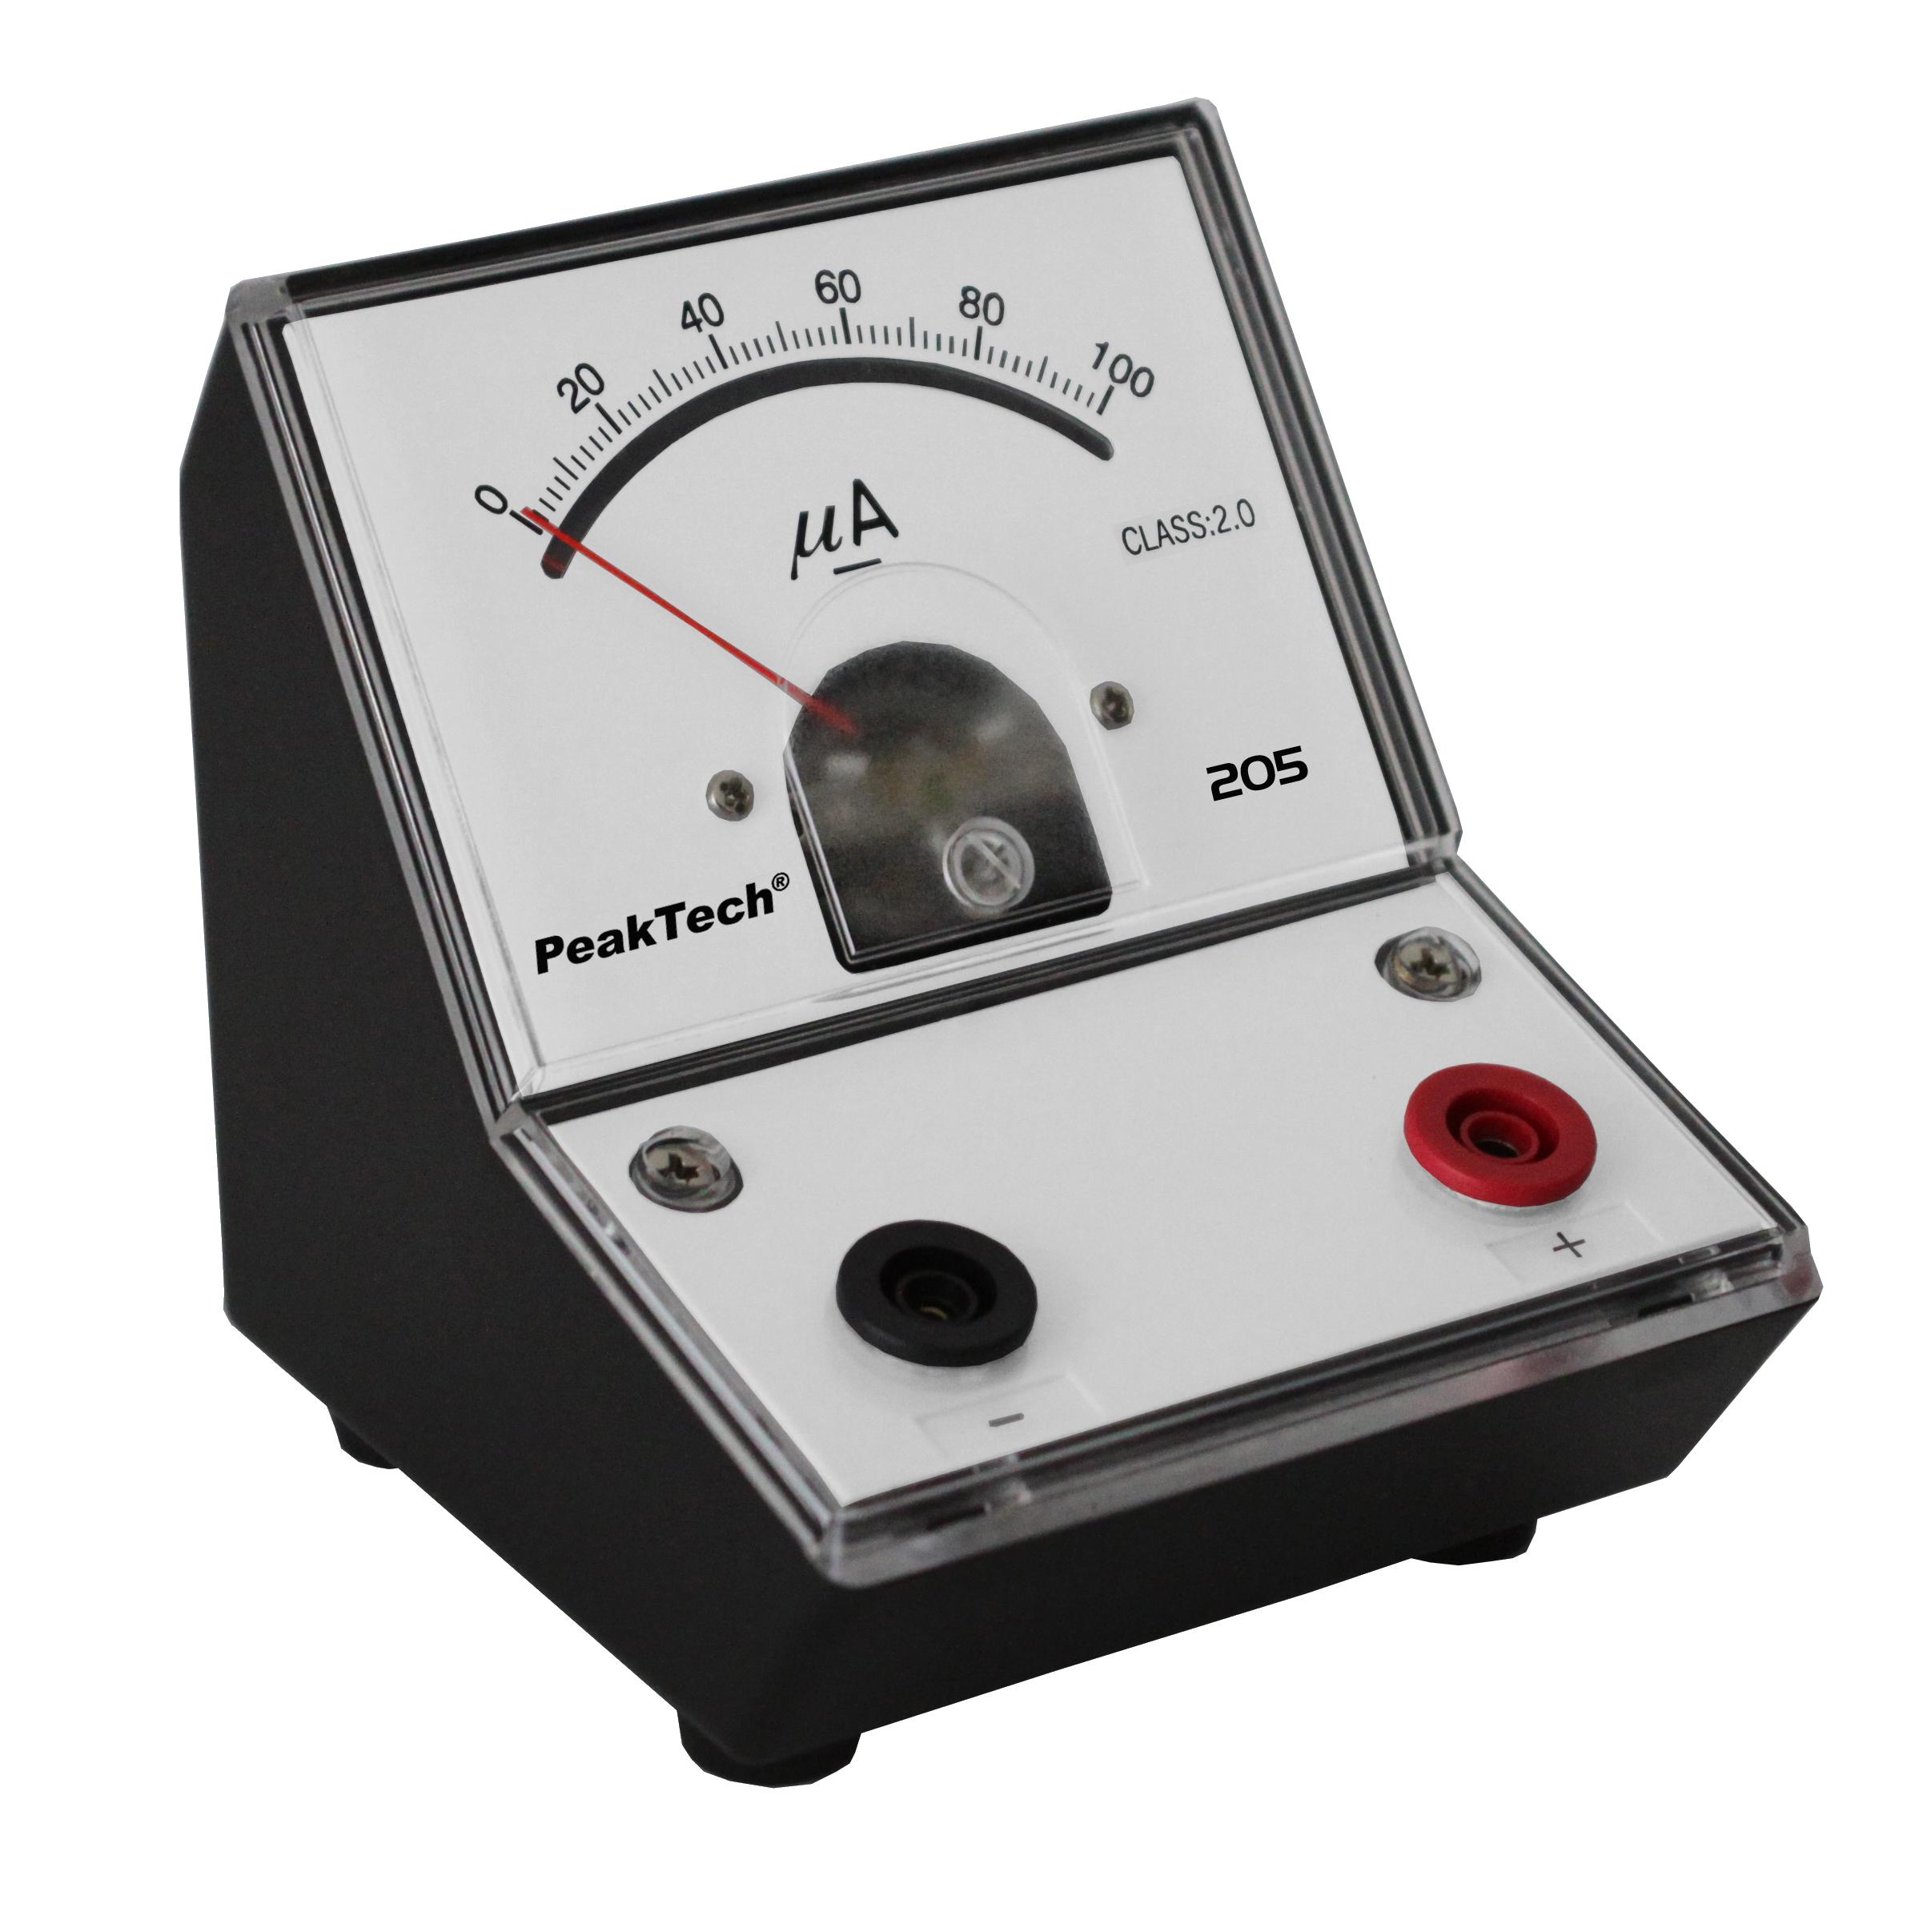 «PeakTech® P 205-02» Analog amperemeter - 0 ... 100µA DC